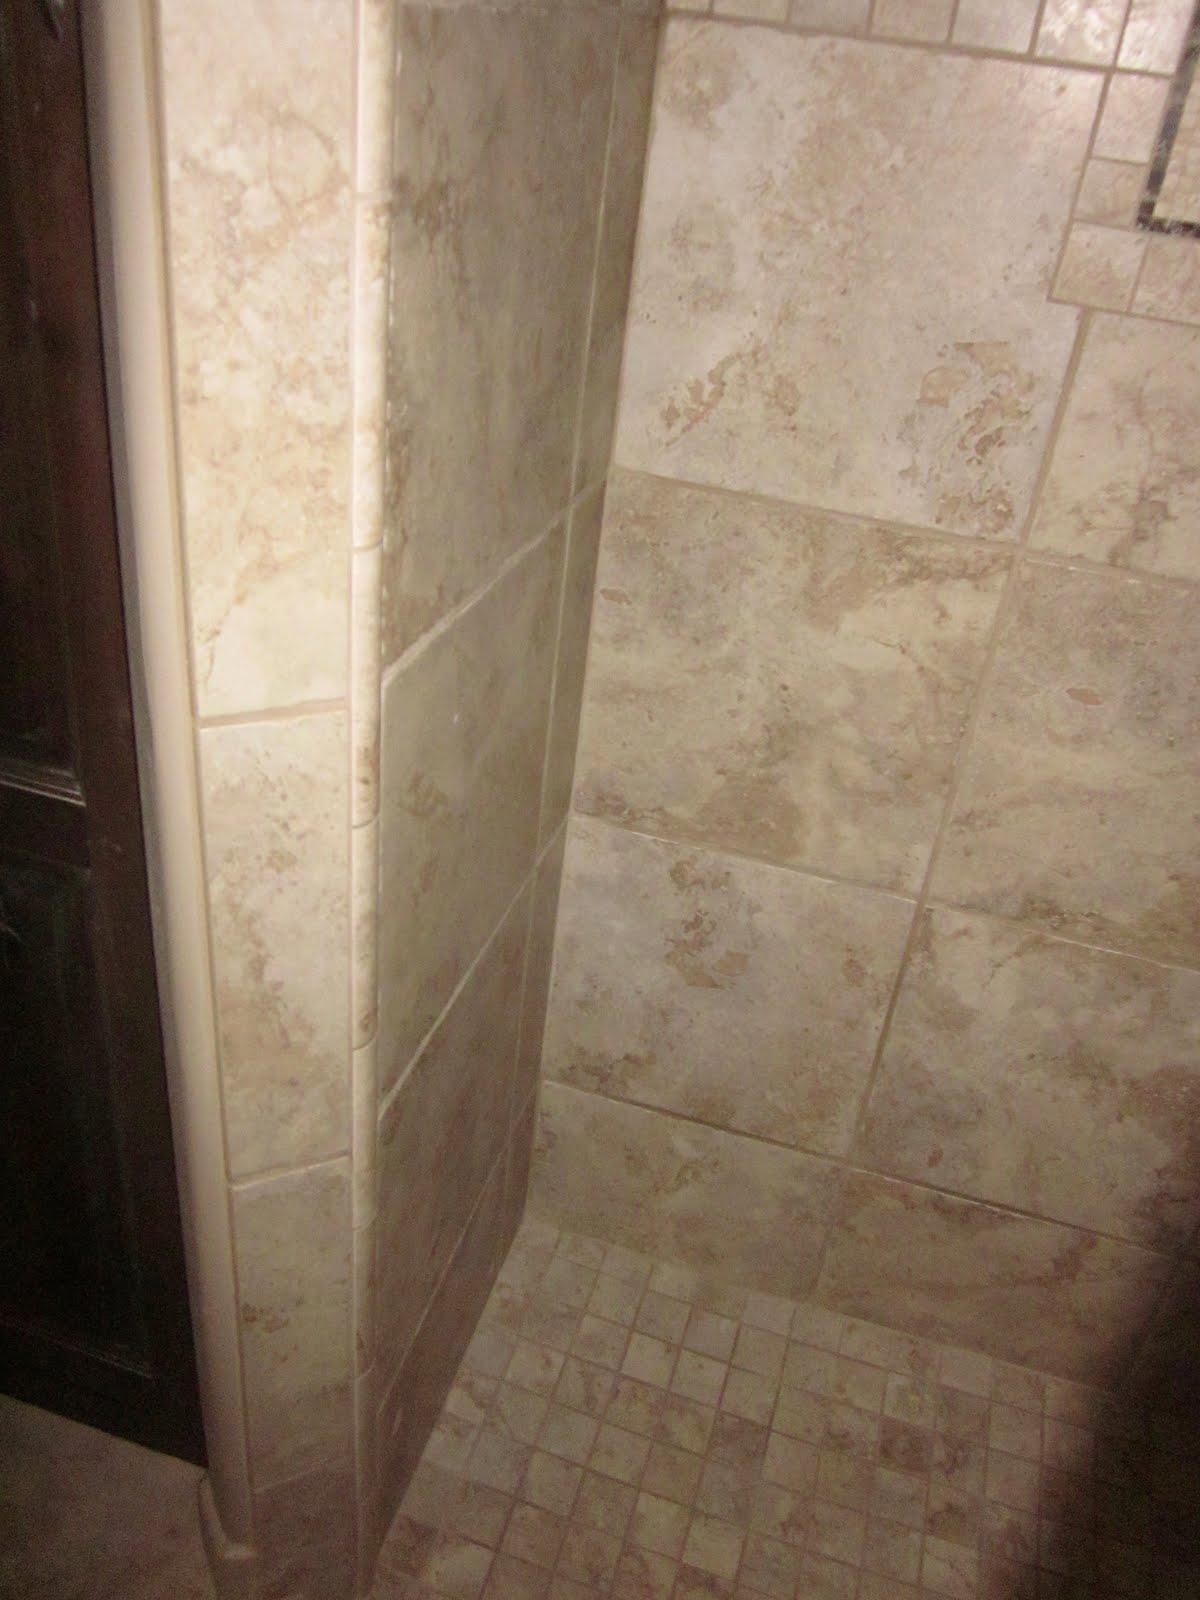 http://4.bp.blogspot.com/-8nEk_0zOMWs/TfzzyItdU8I/AAAAAAAAAJU/M_--ObJRbqk/s1600/Close+up+of+quarter+round+tile+to+get+around+corner+to+door+jam.jpg